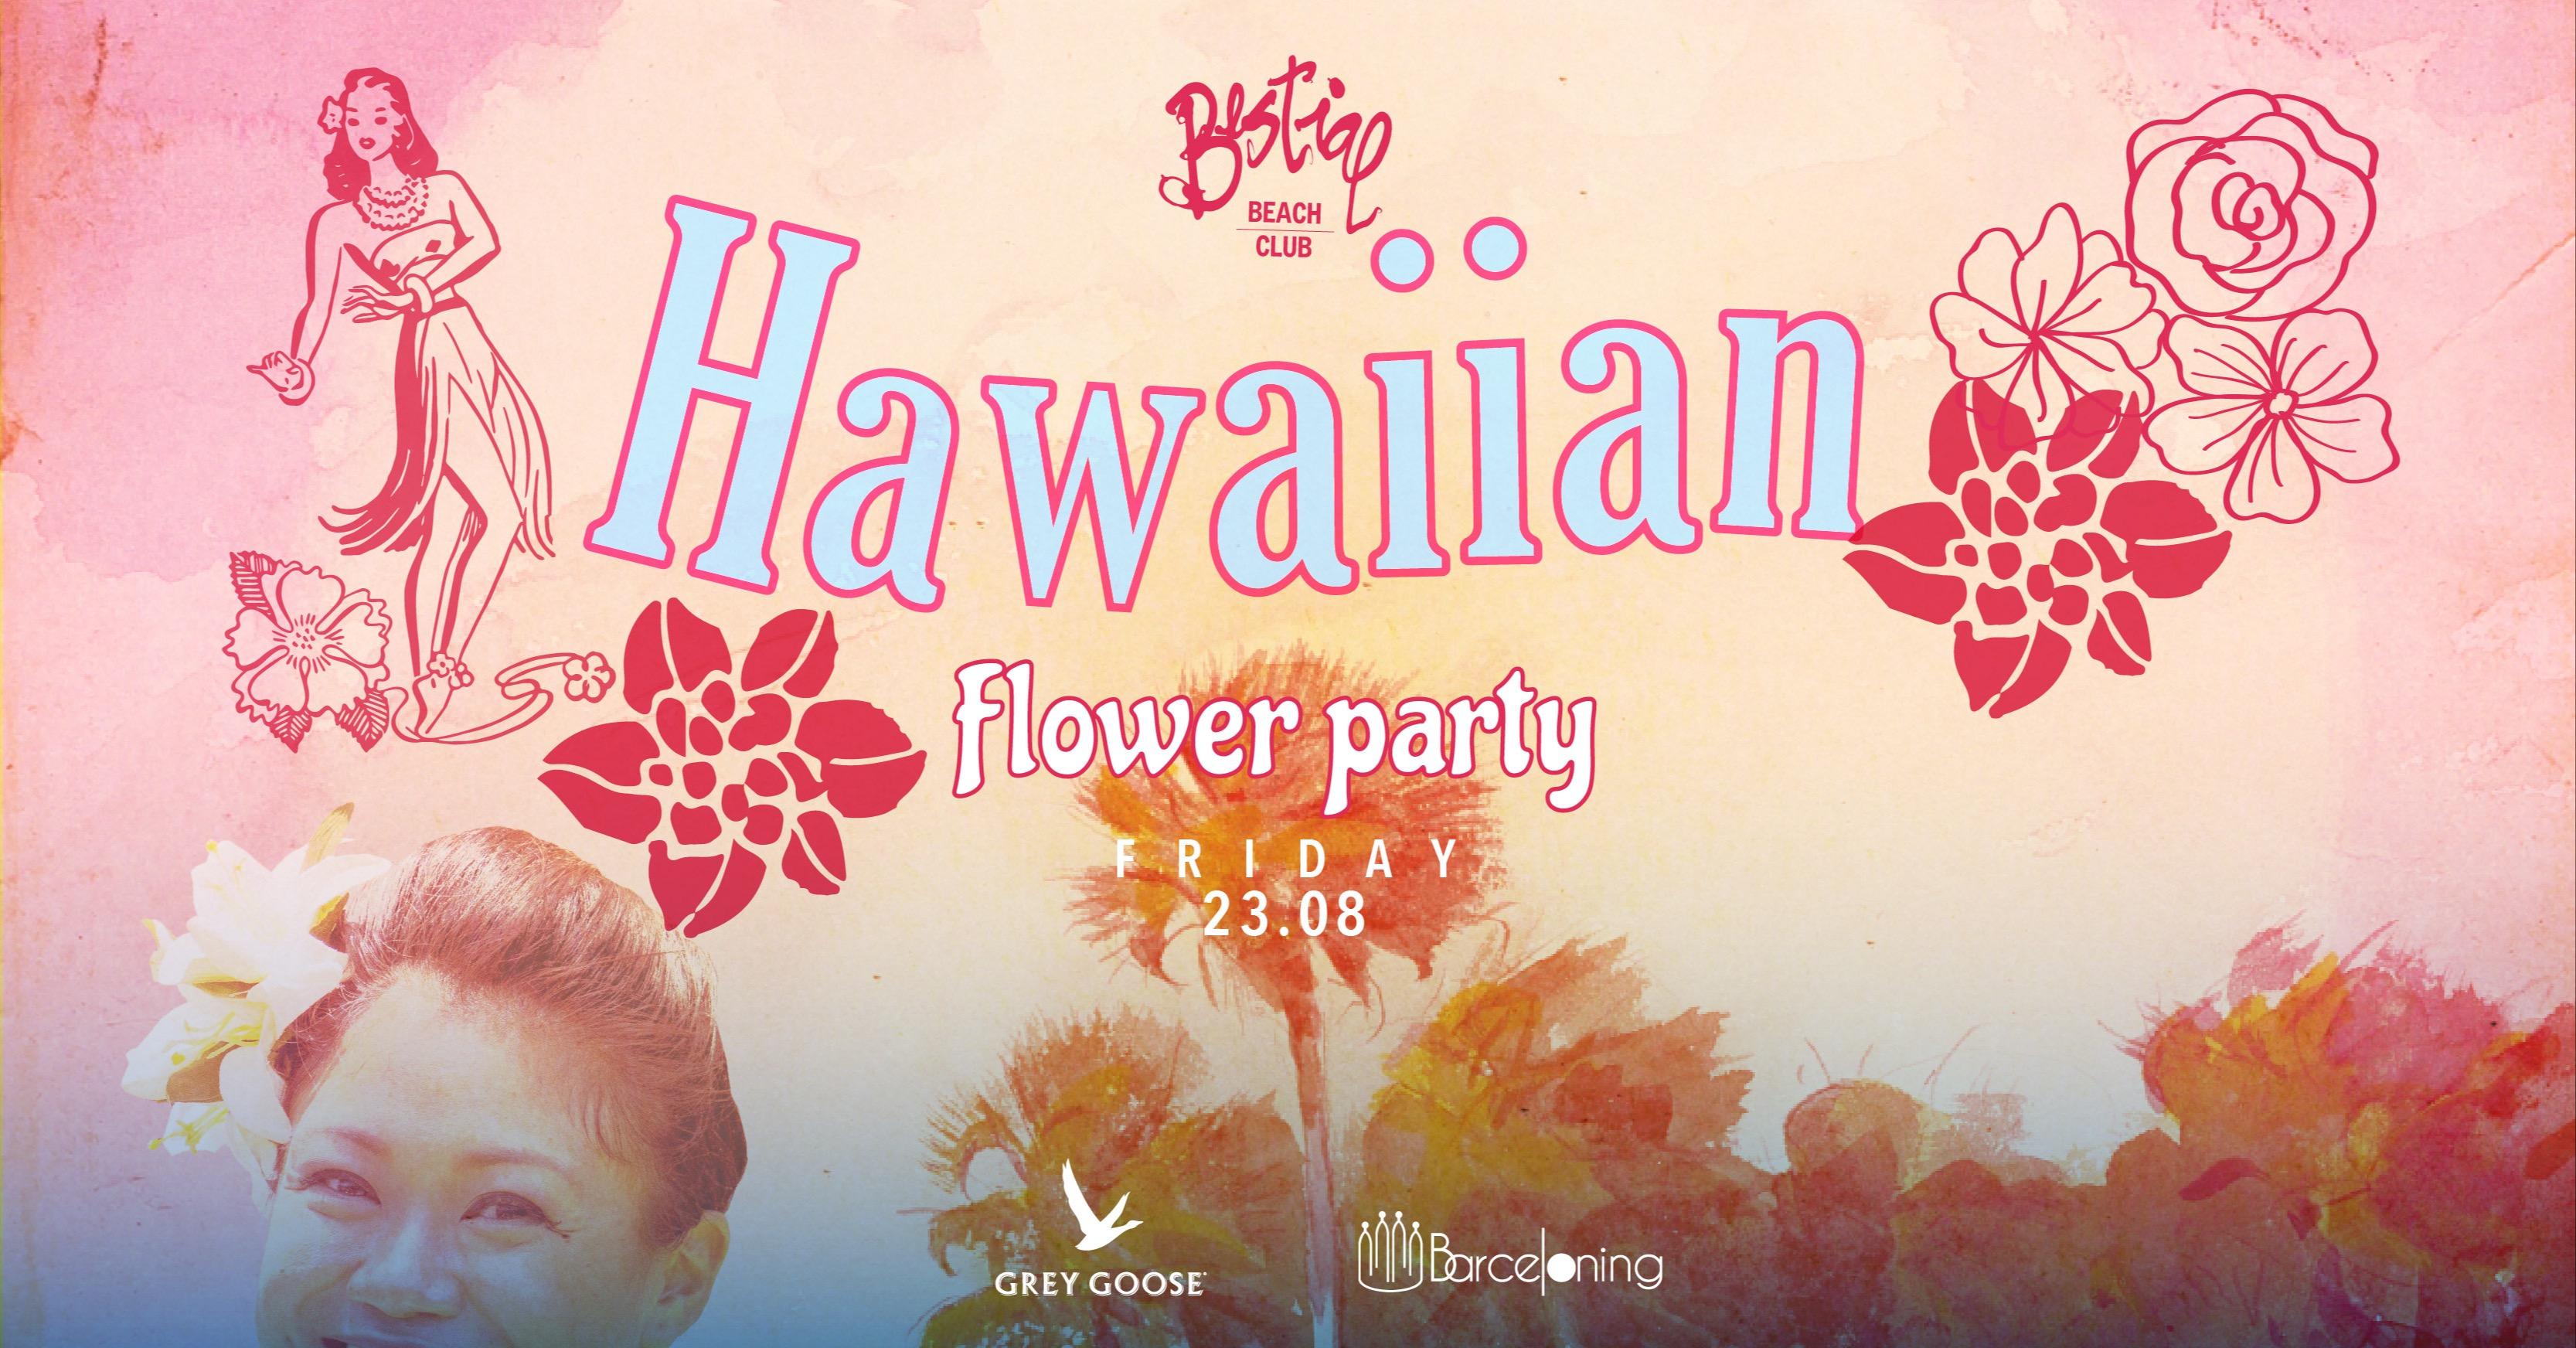 Aloha Hawaii - Club BESTIAL BEACH CLUB